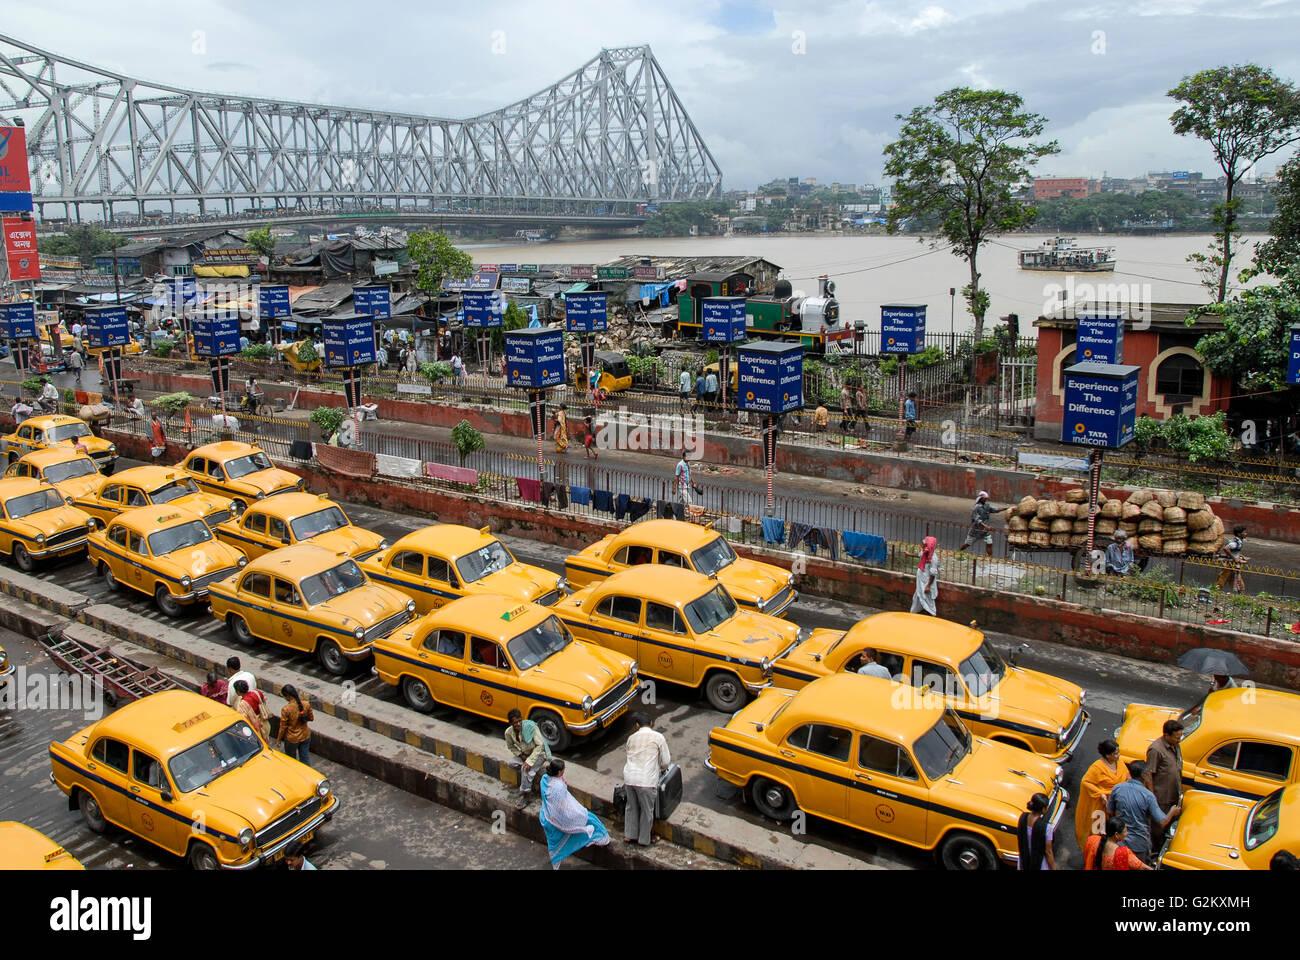 INDIA Westbengal Calcutta Kolkata , waiting yellow HM Ambassador cabs infront of Howrah railway station, view to Stock Photo